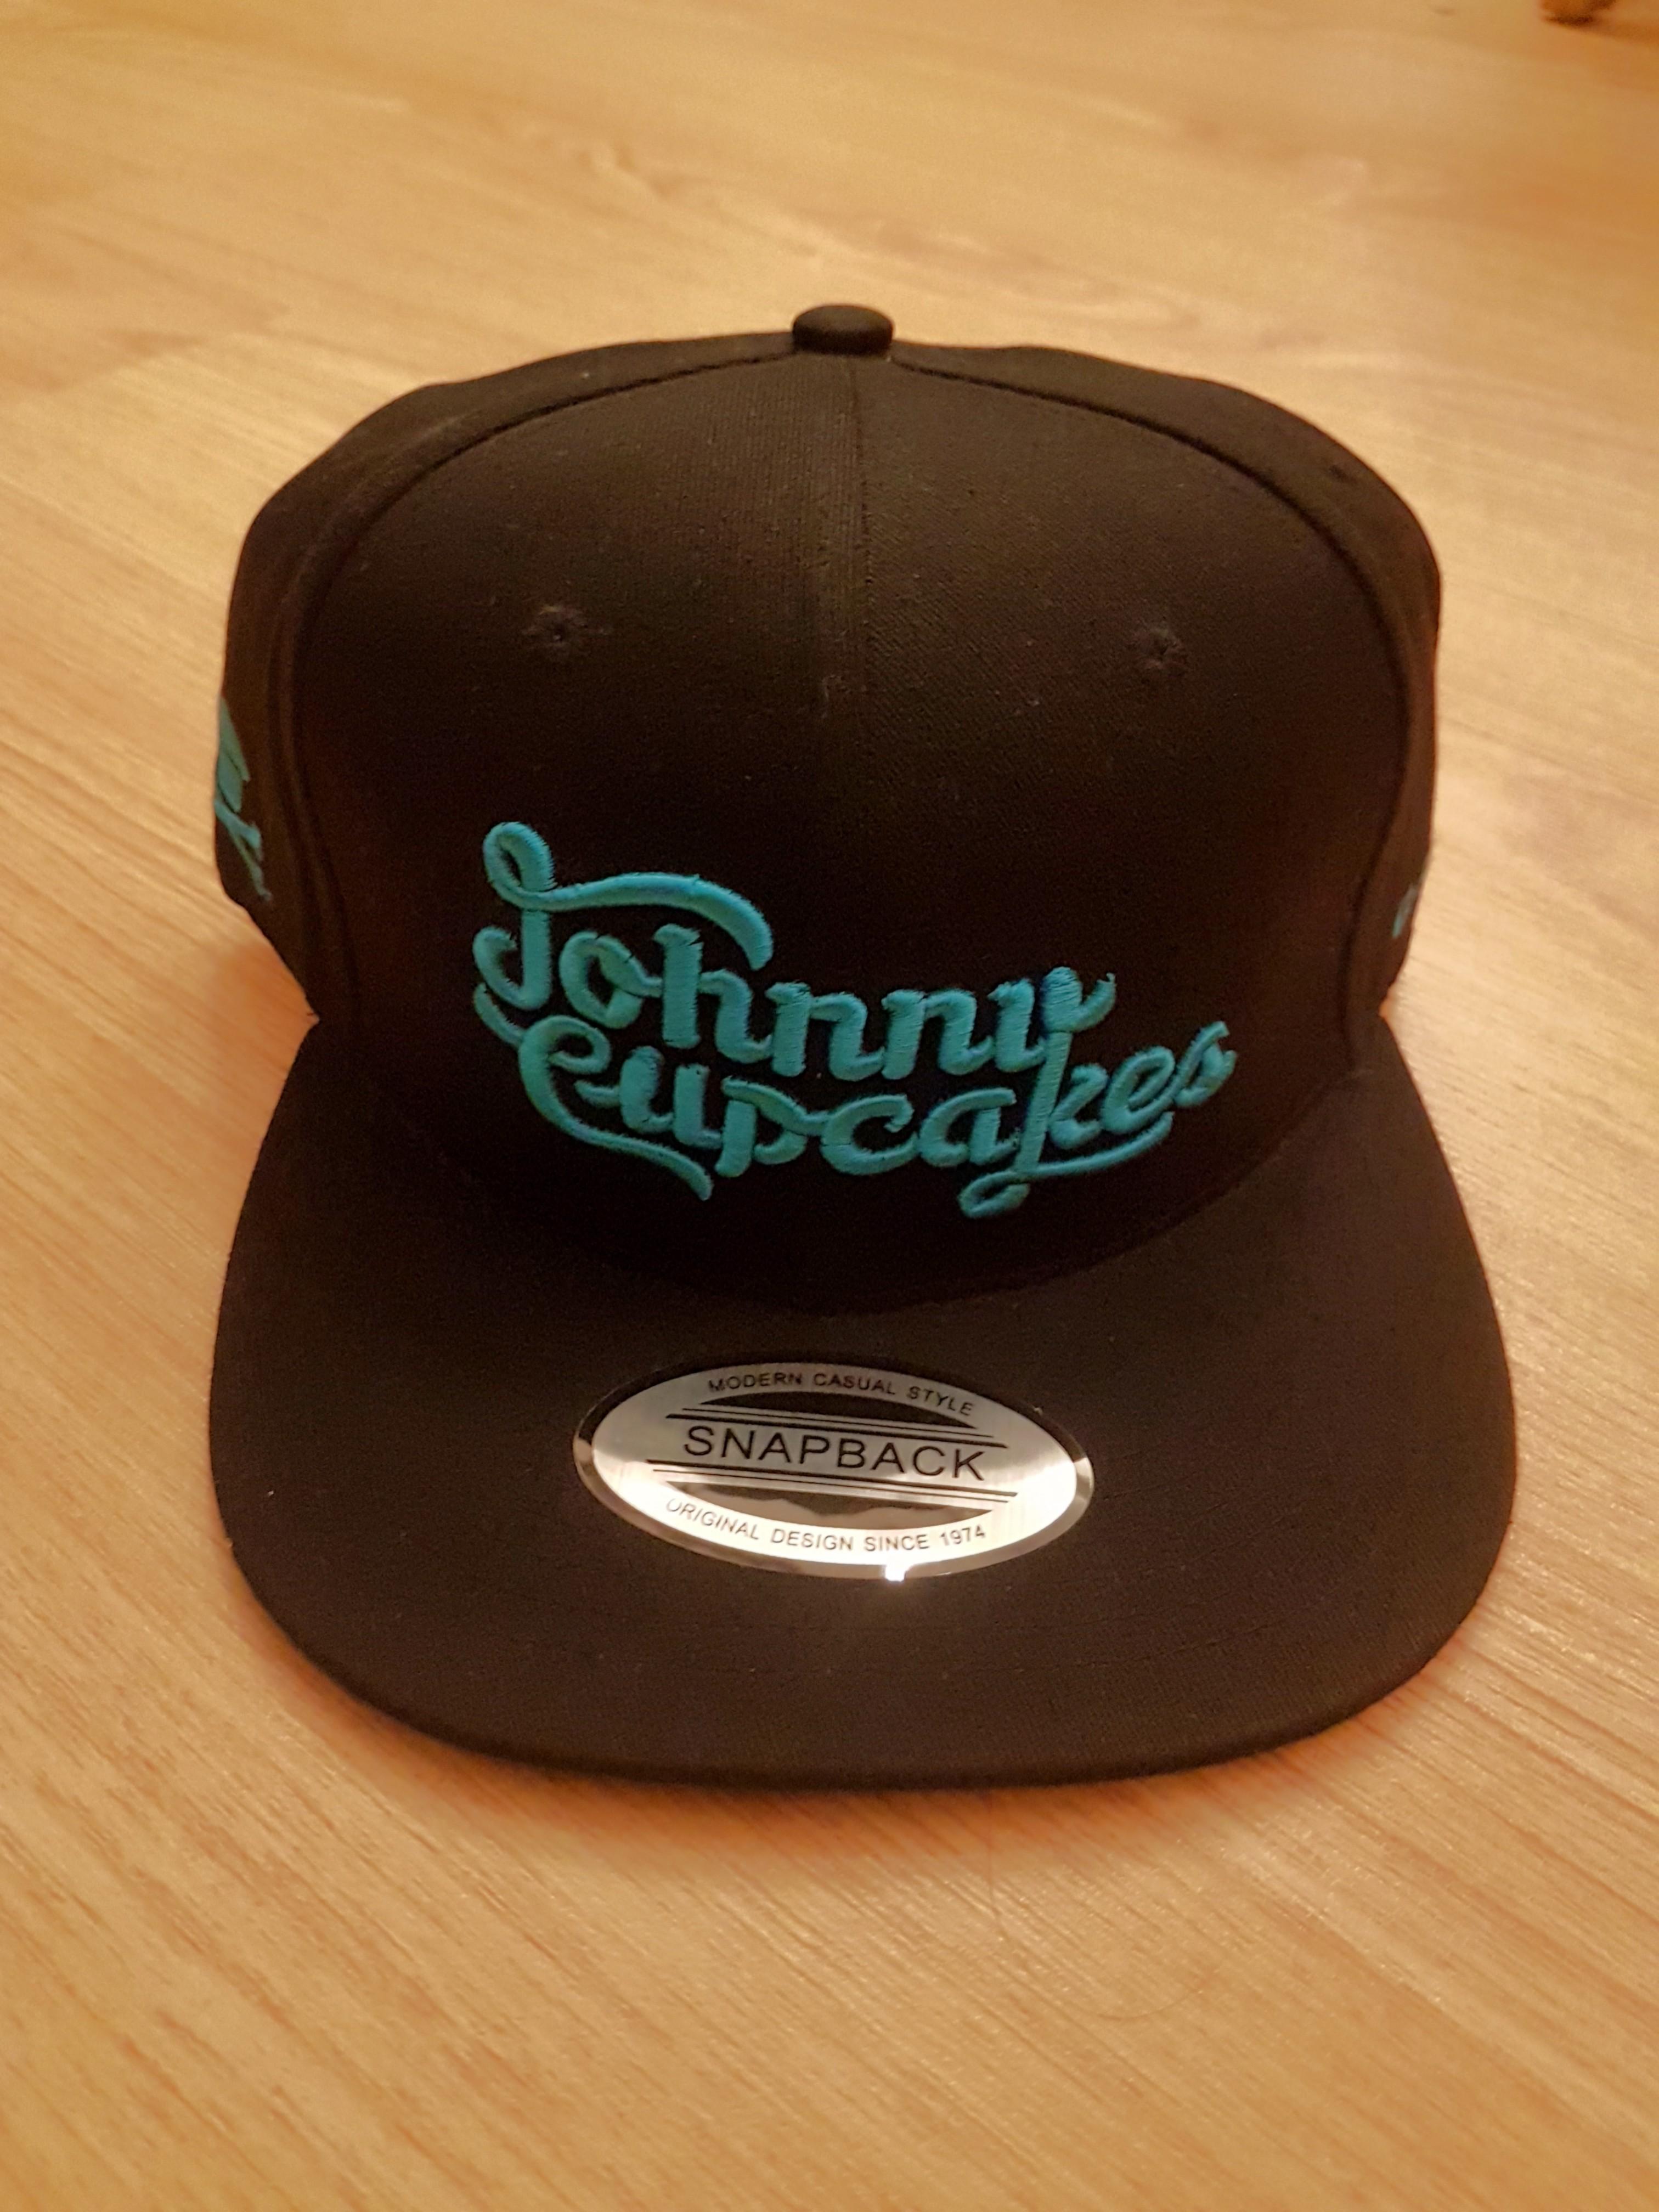 ac91b72901358 Johnny Cupcakes G-Shock Snap back Cap